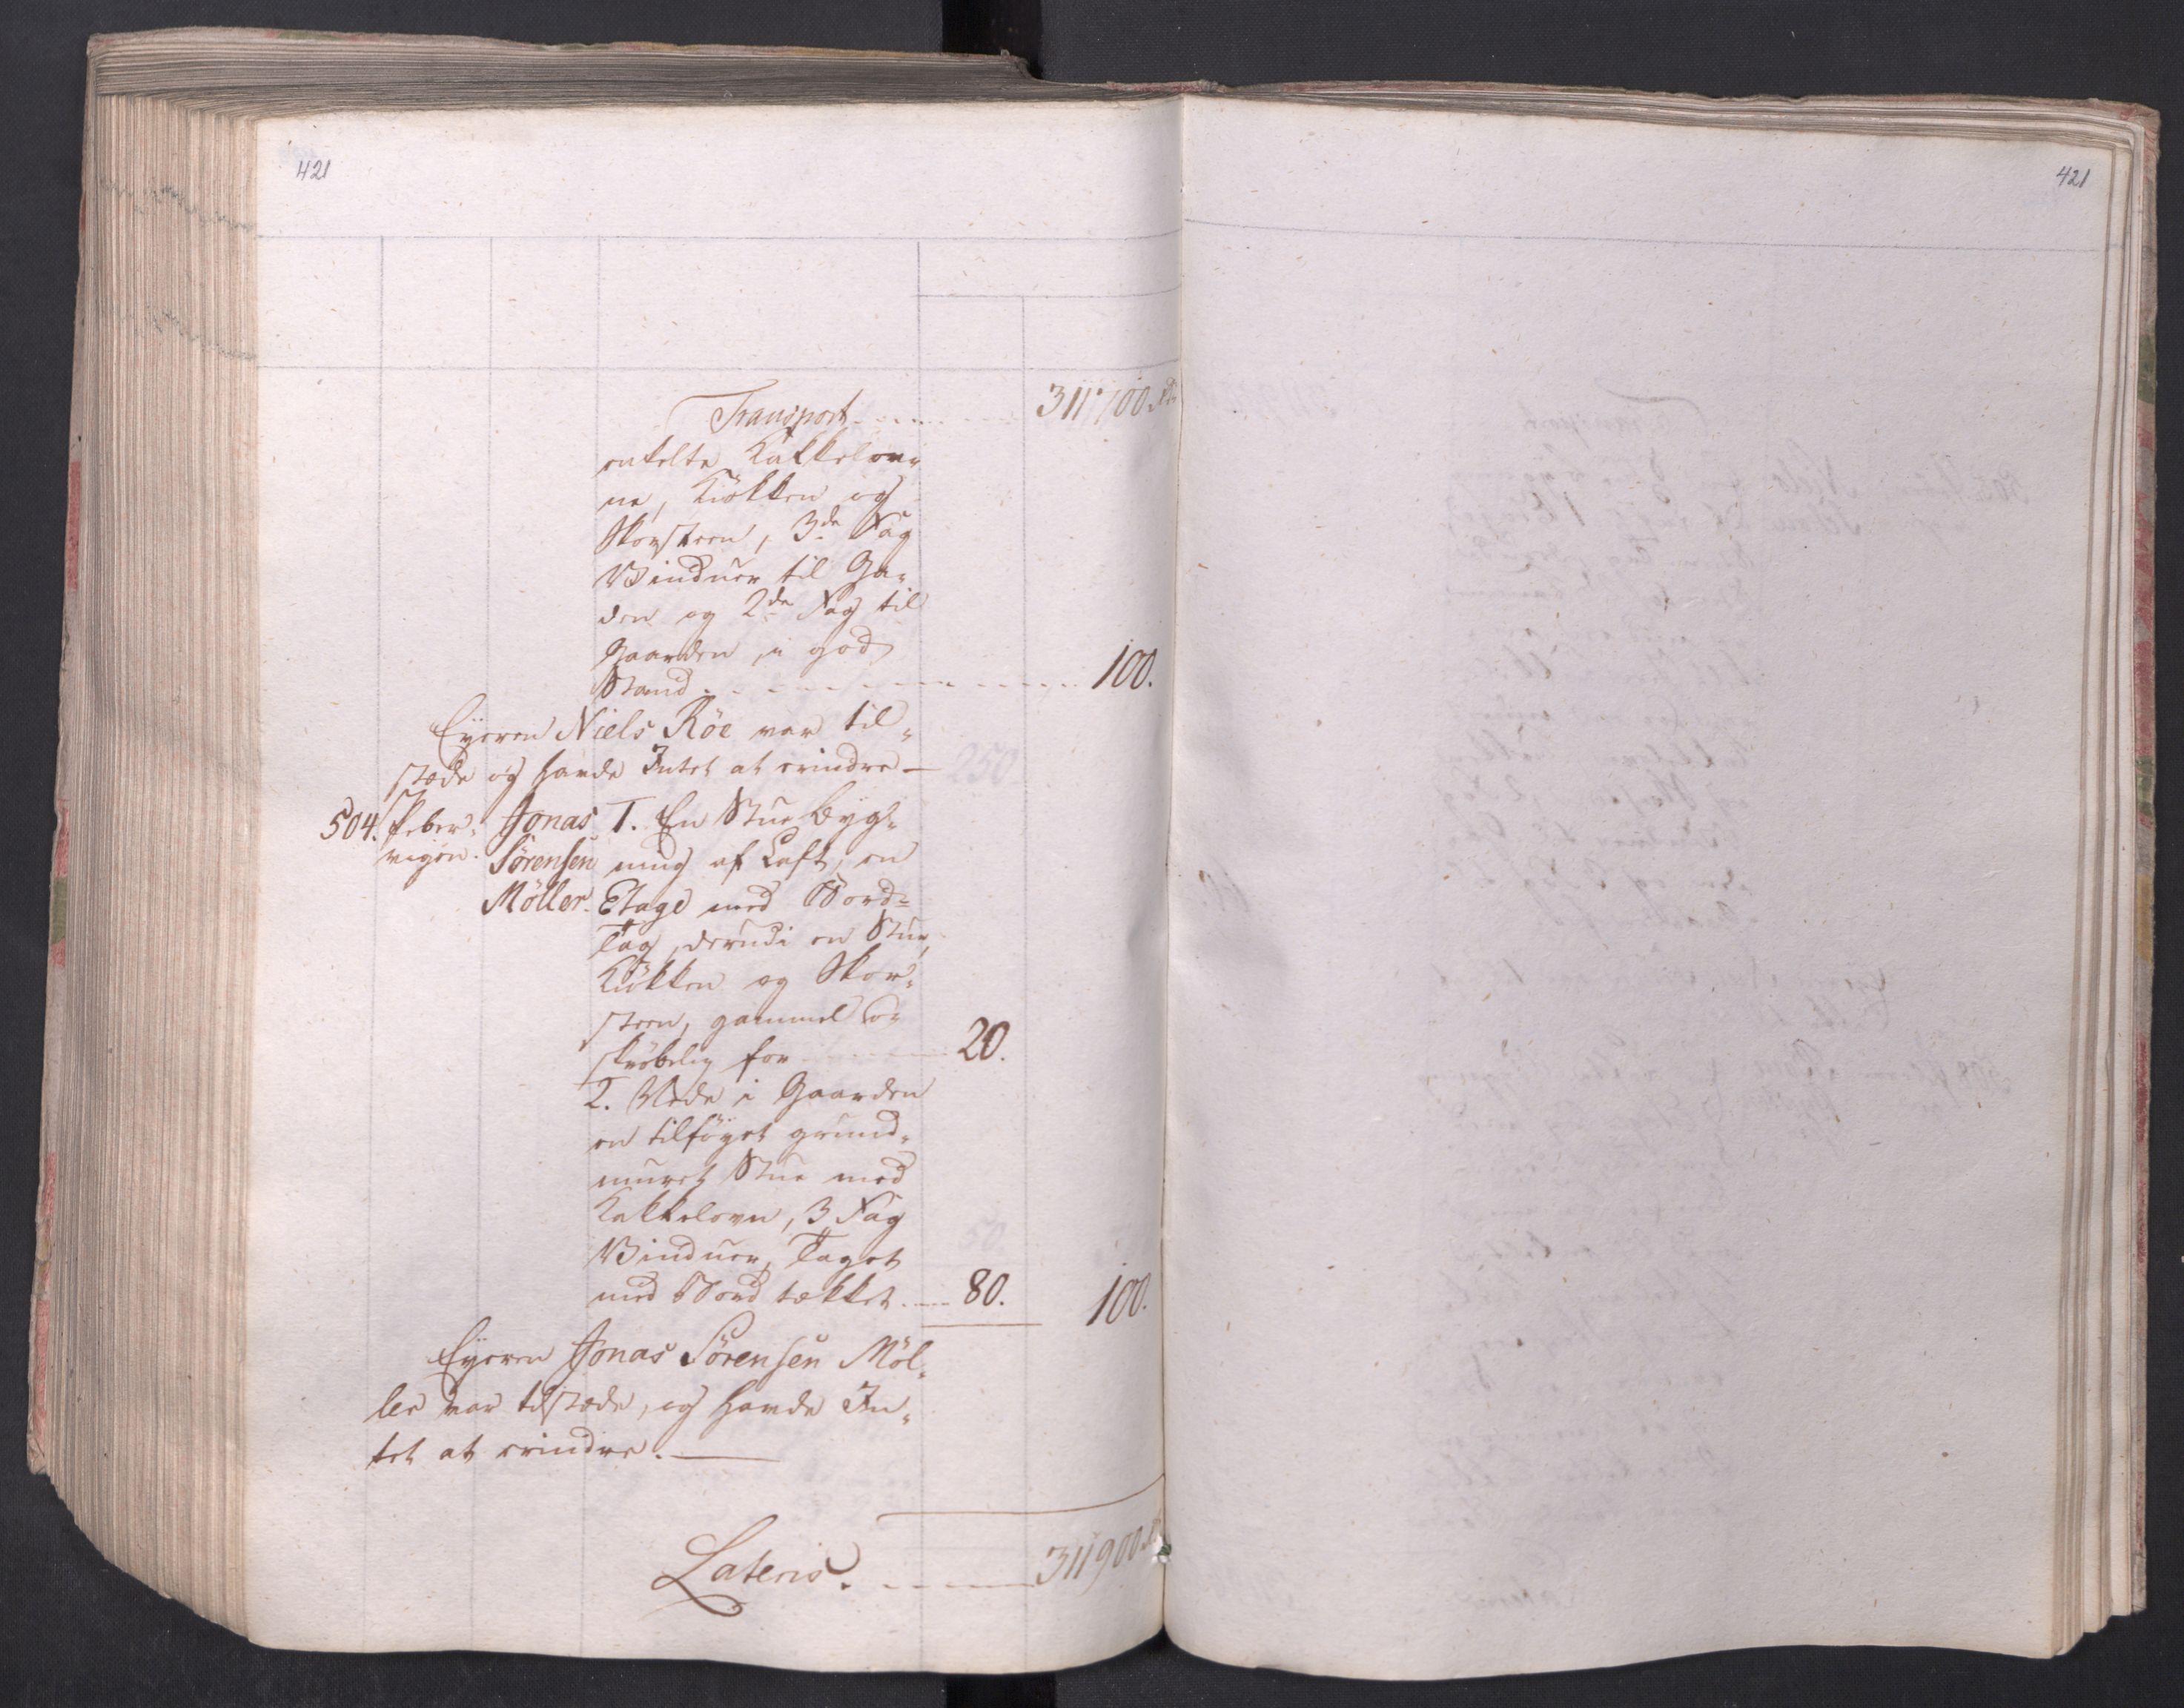 SAO, Kristiania stiftamt, I/Ia/L0015: Branntakster, 1797, s. 421